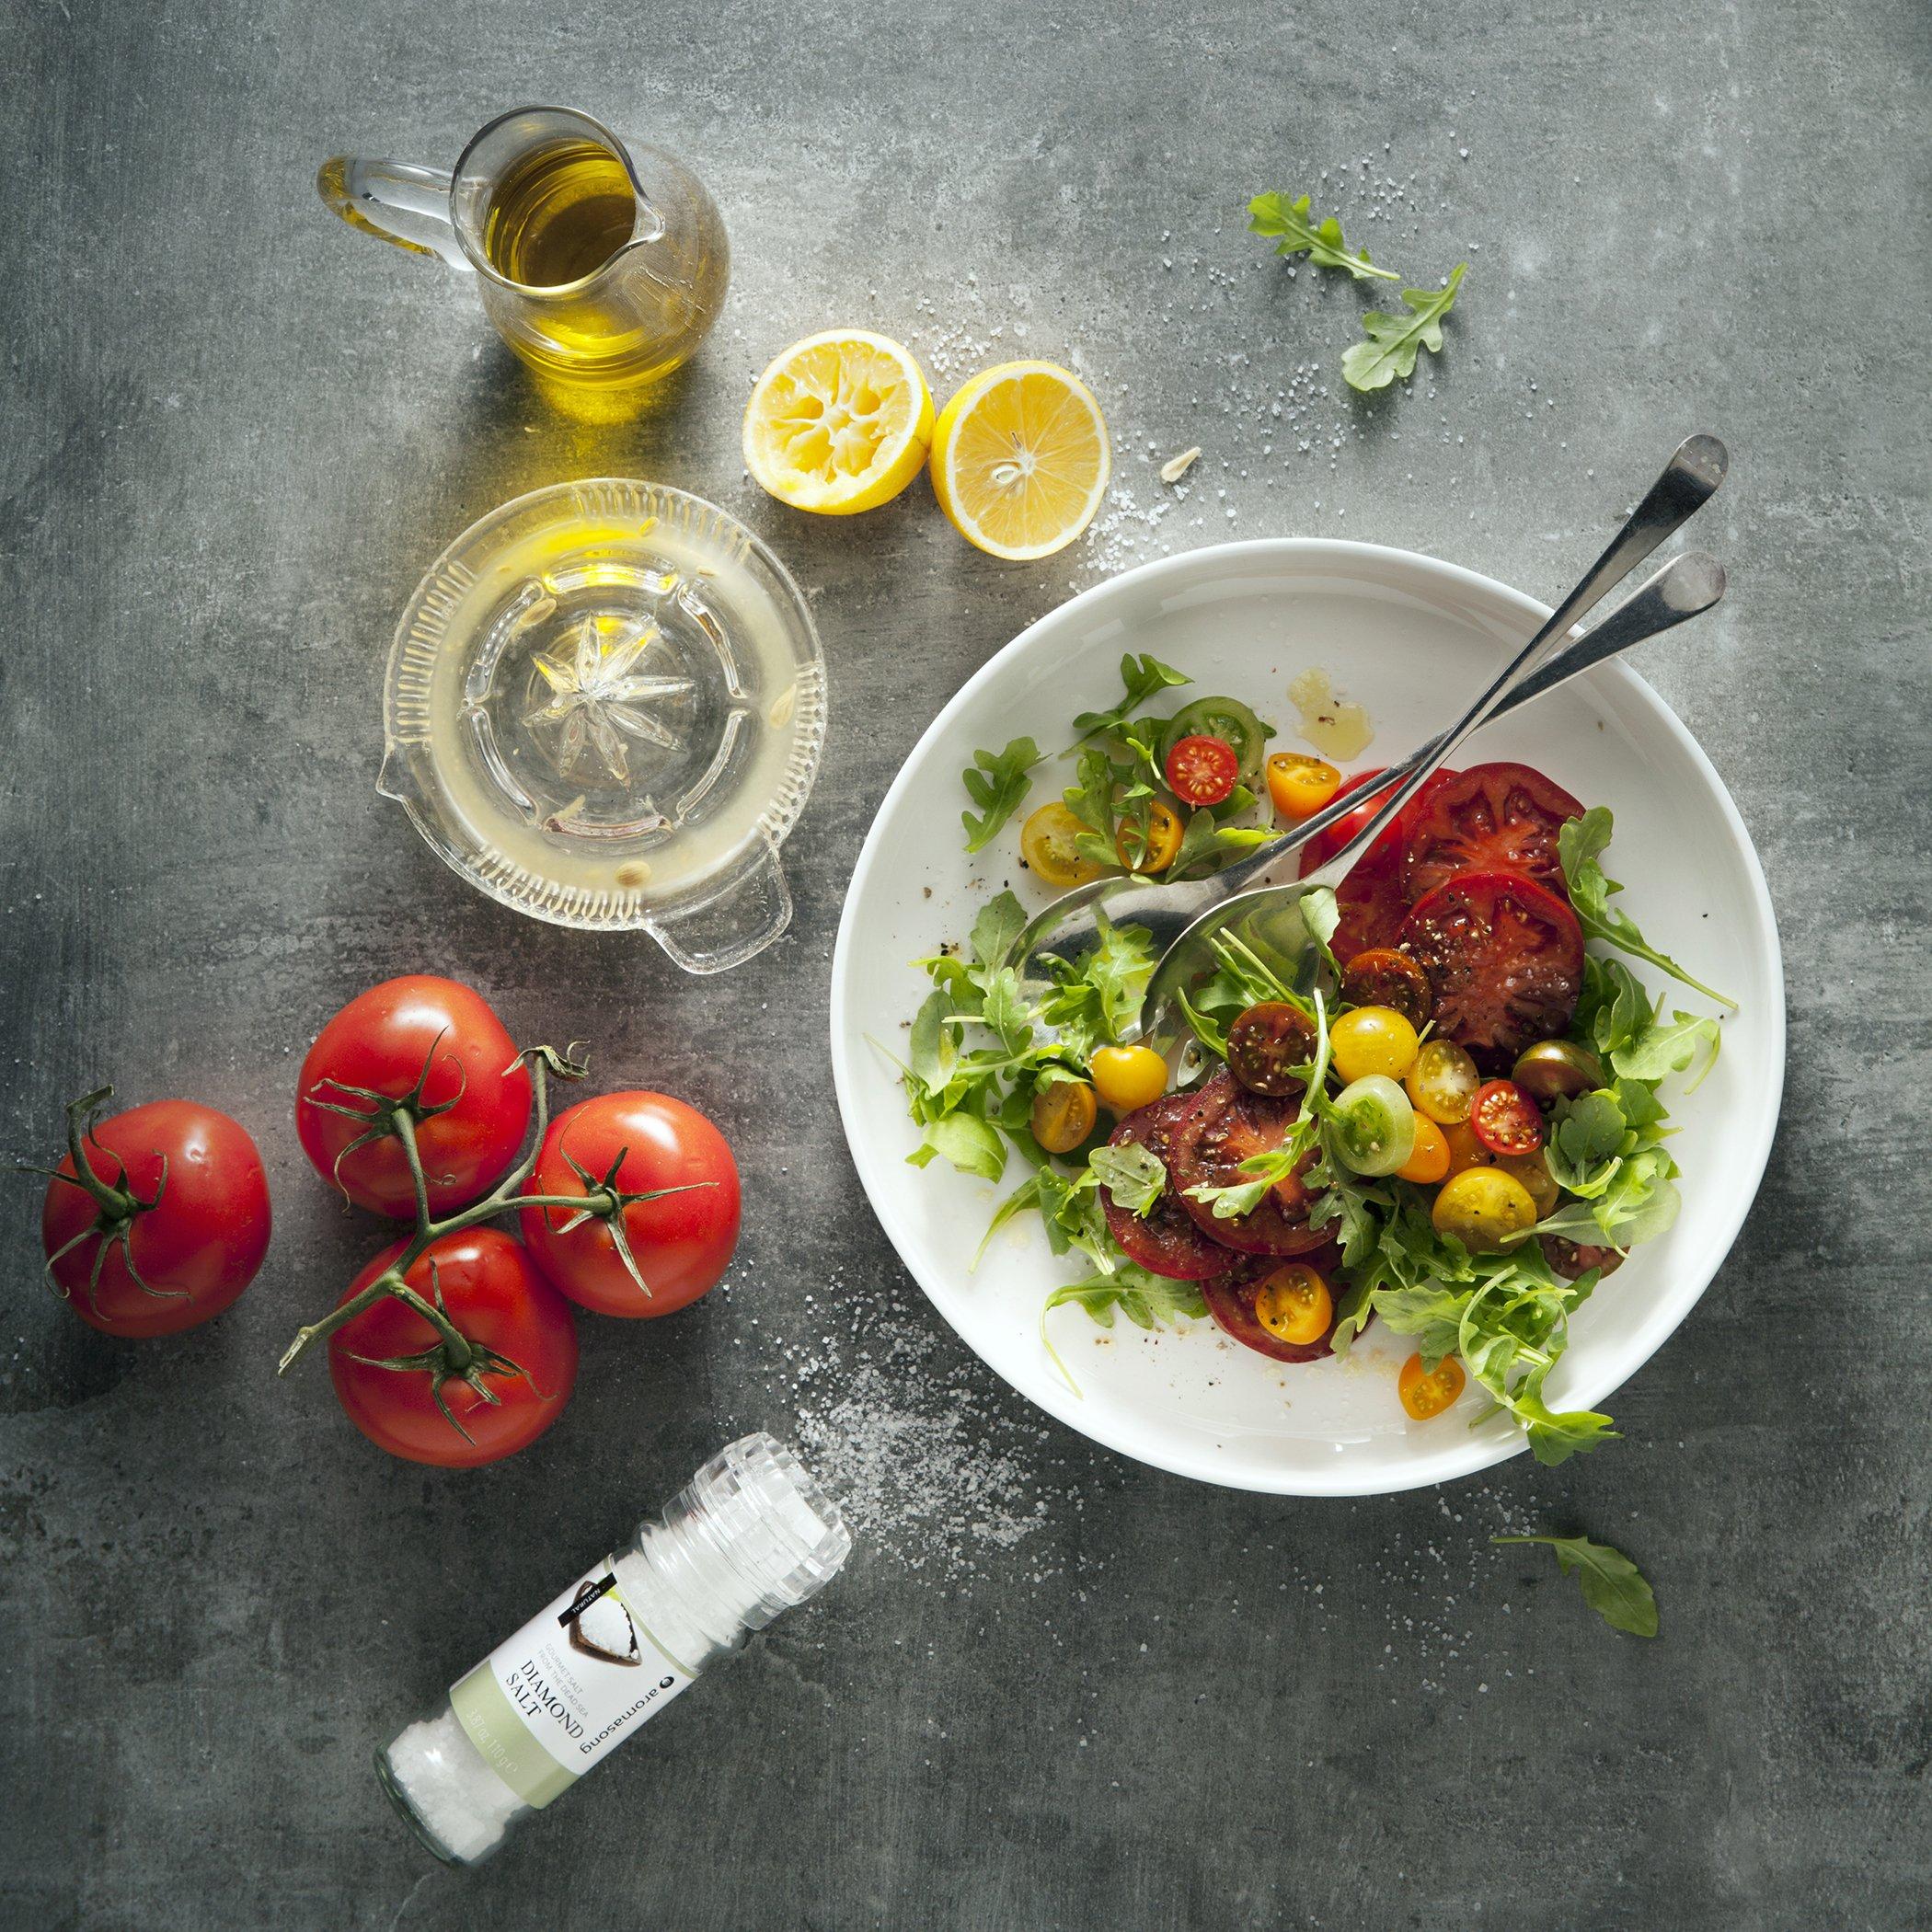 Gourmet Flavored Dead Sea Salt in Grinder, Garlic Milano, 3.5 oz by Aromasong (Image #1)